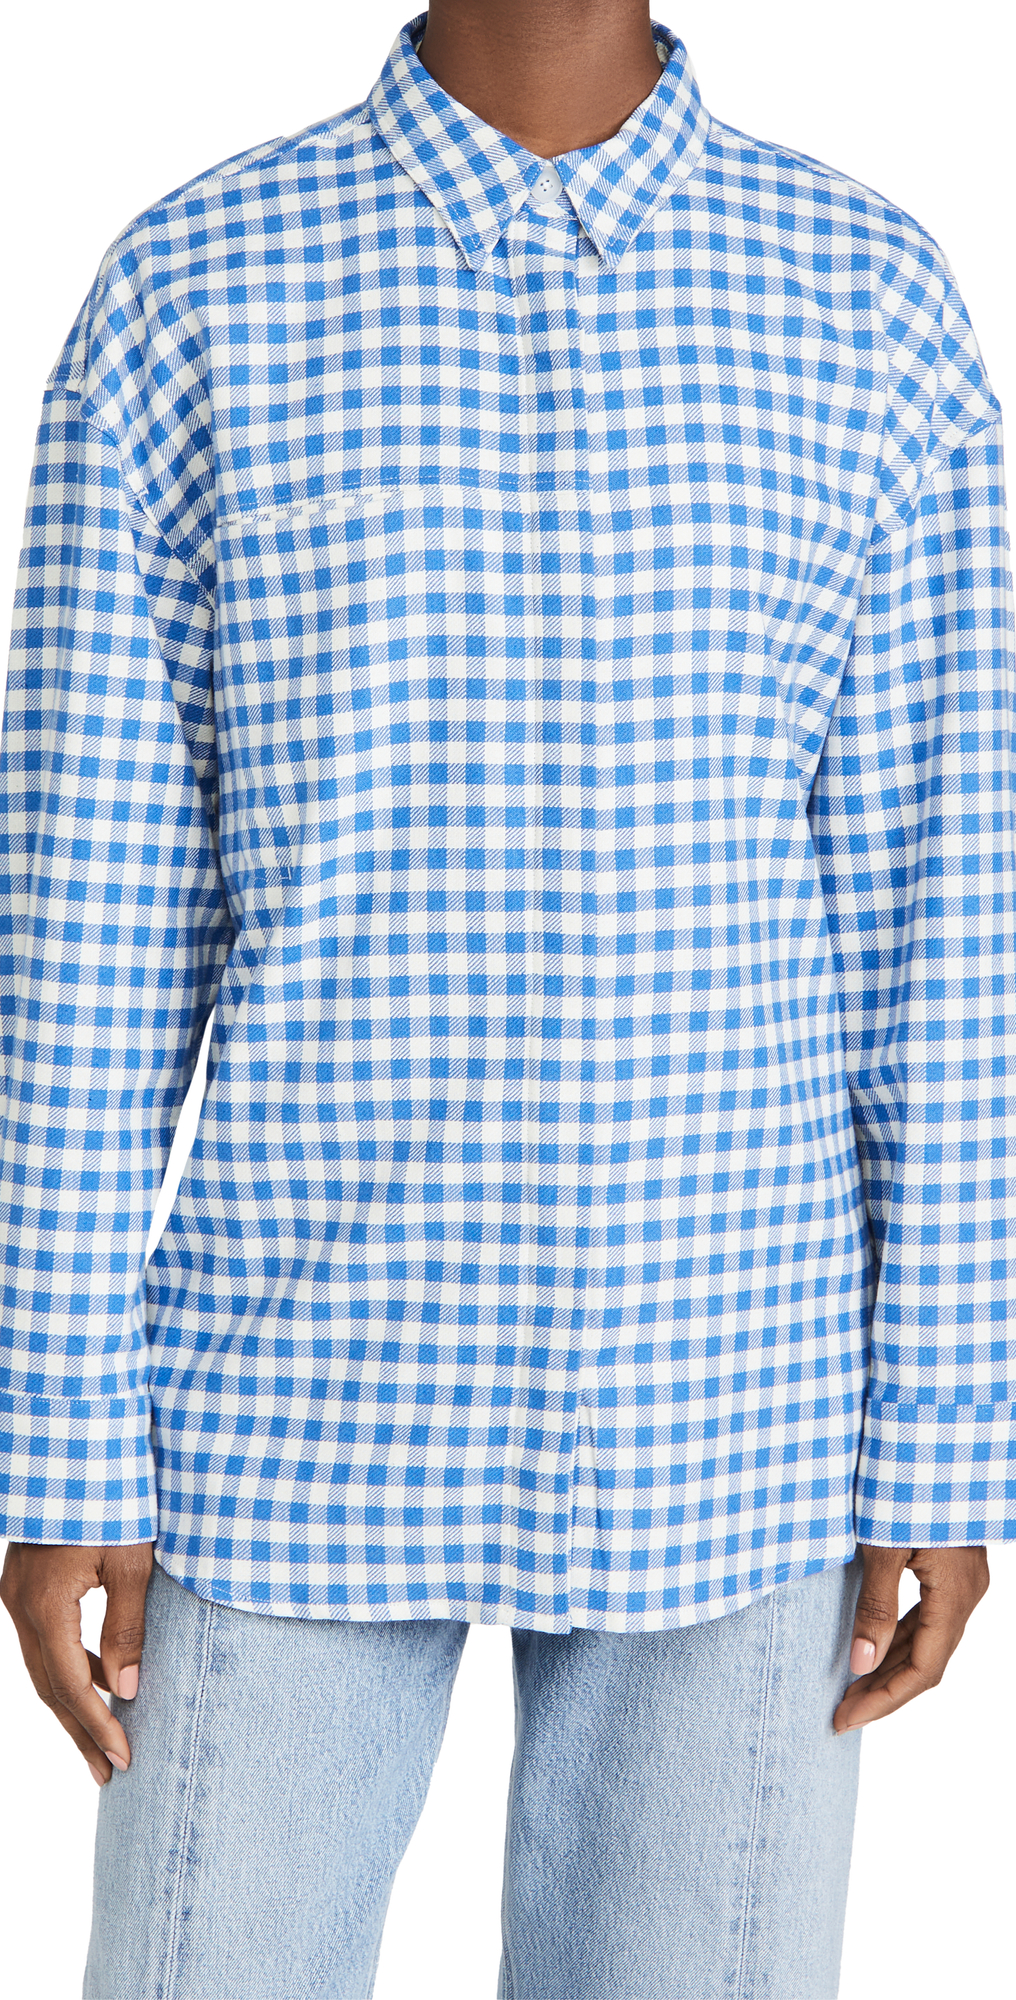 Daisy Check Shirt